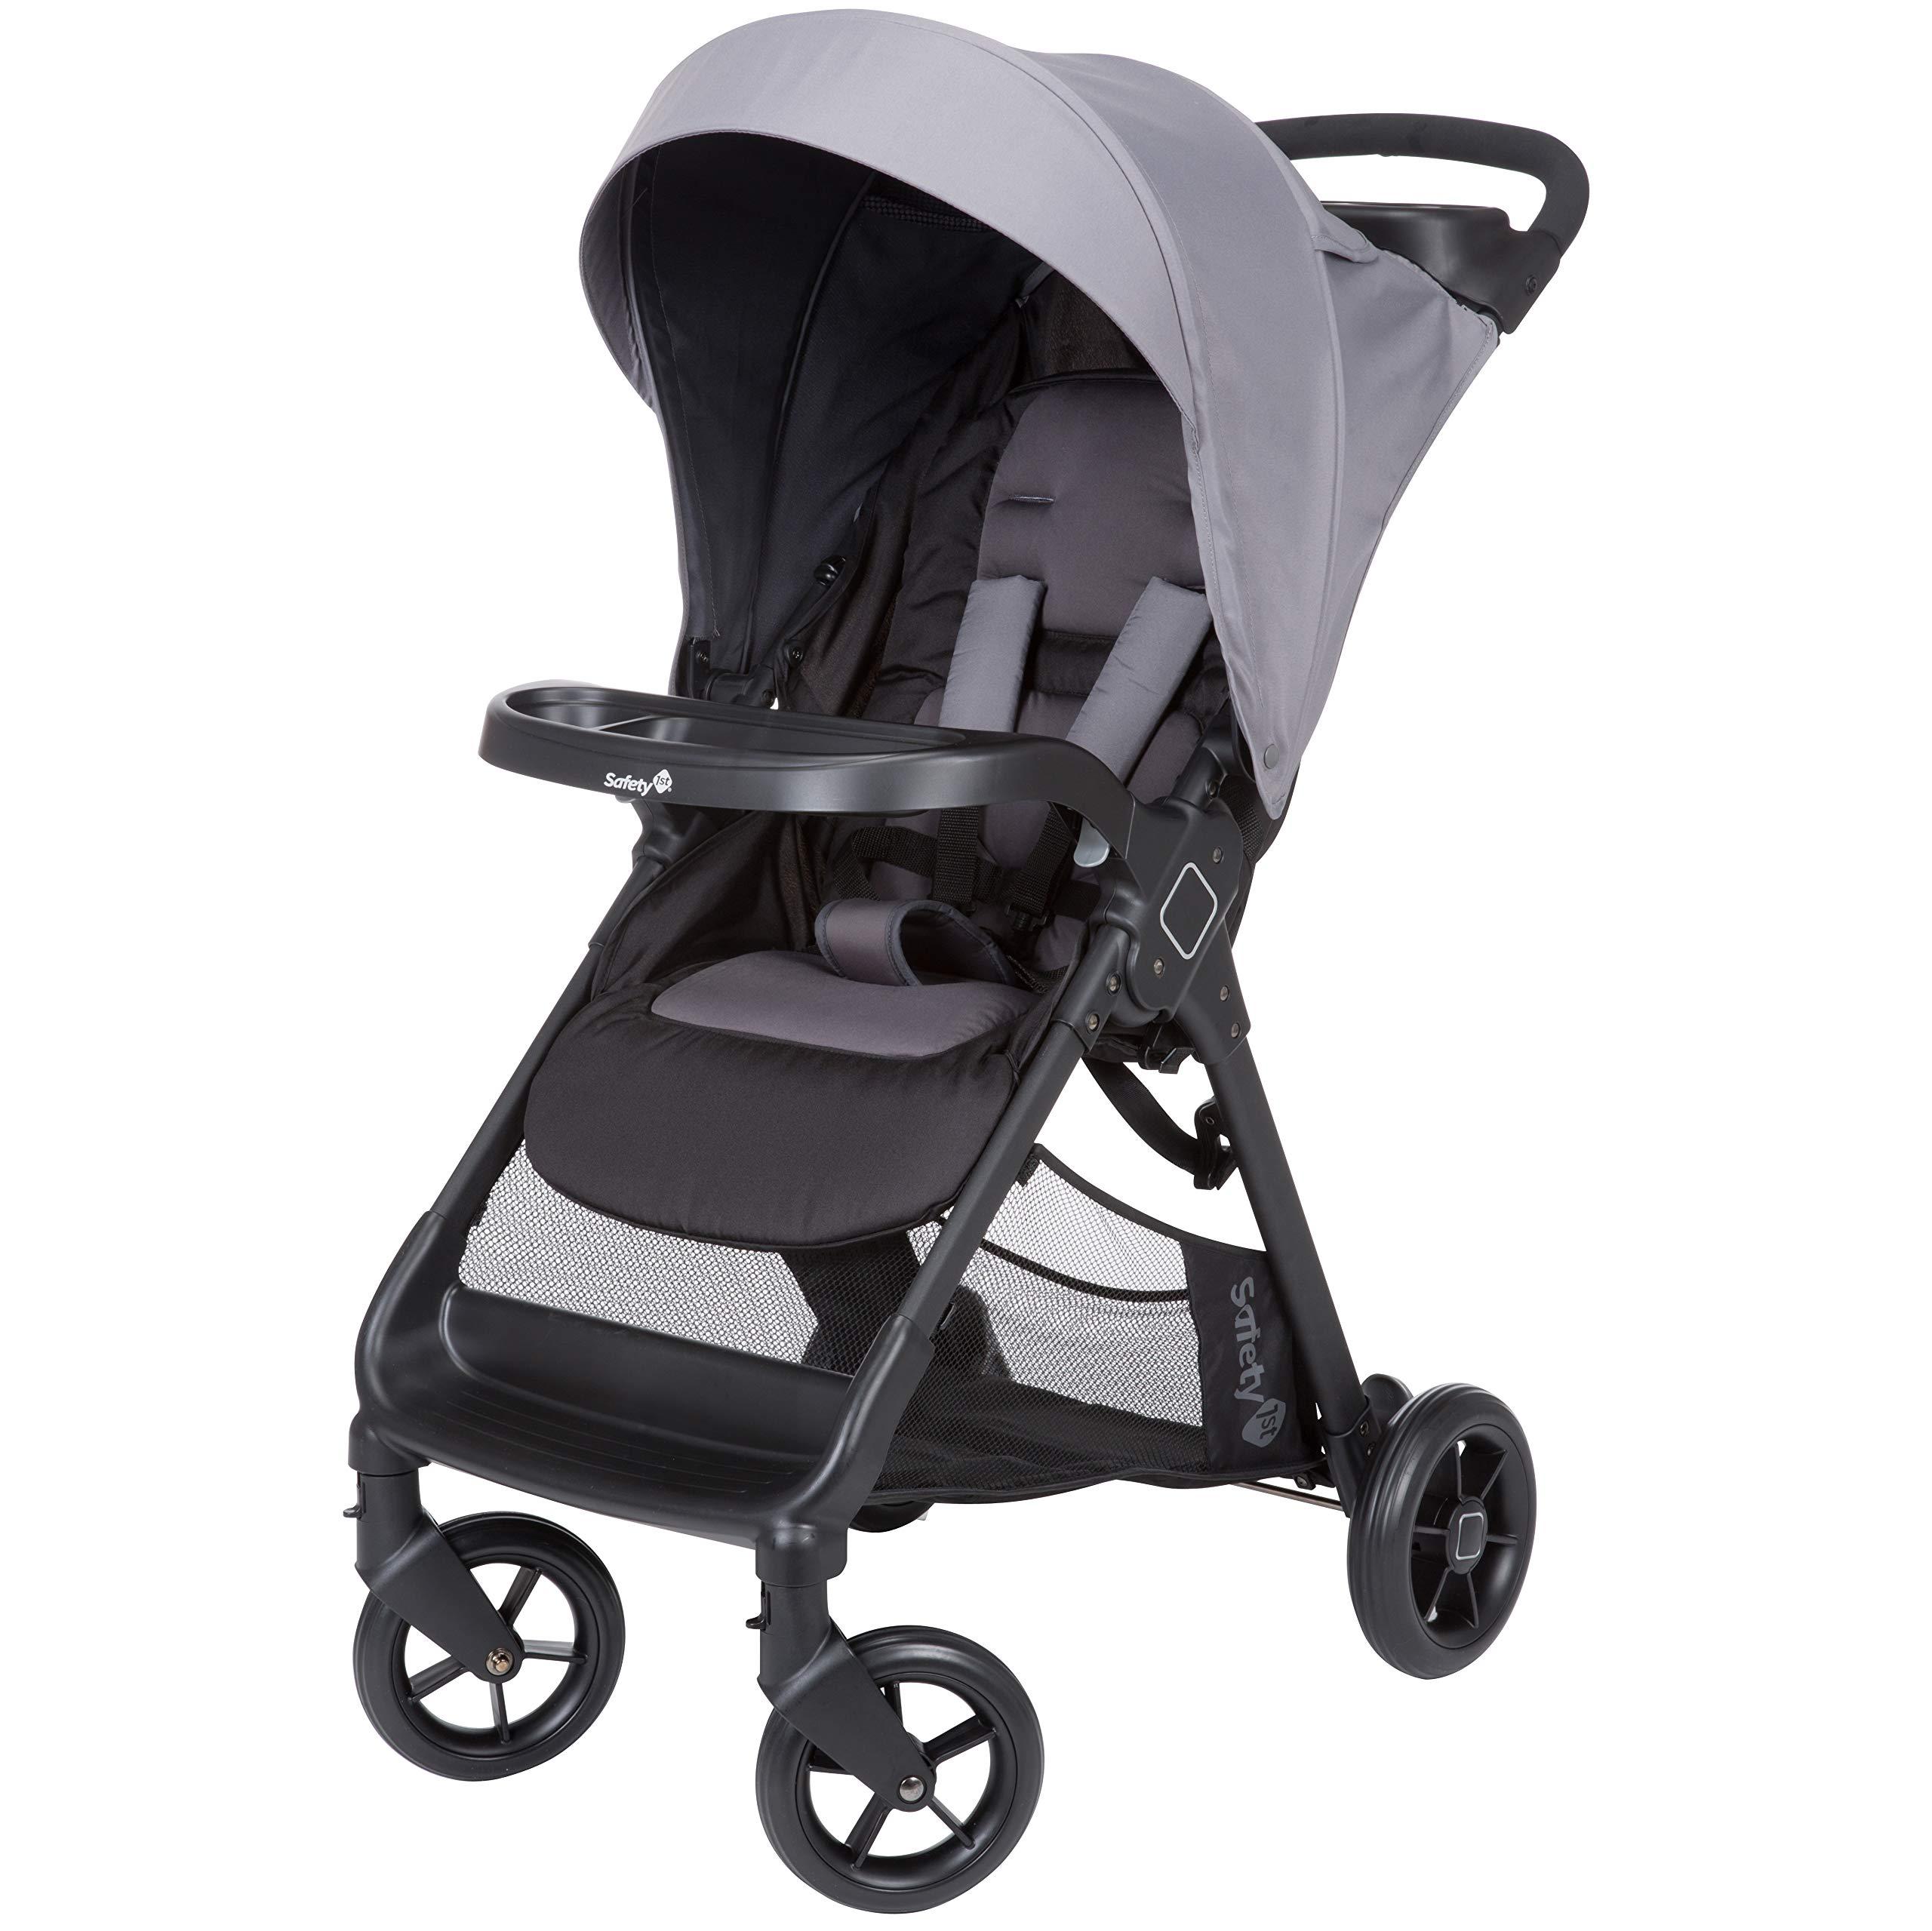 Safety 1st Smooth Ride Stroller, Steel